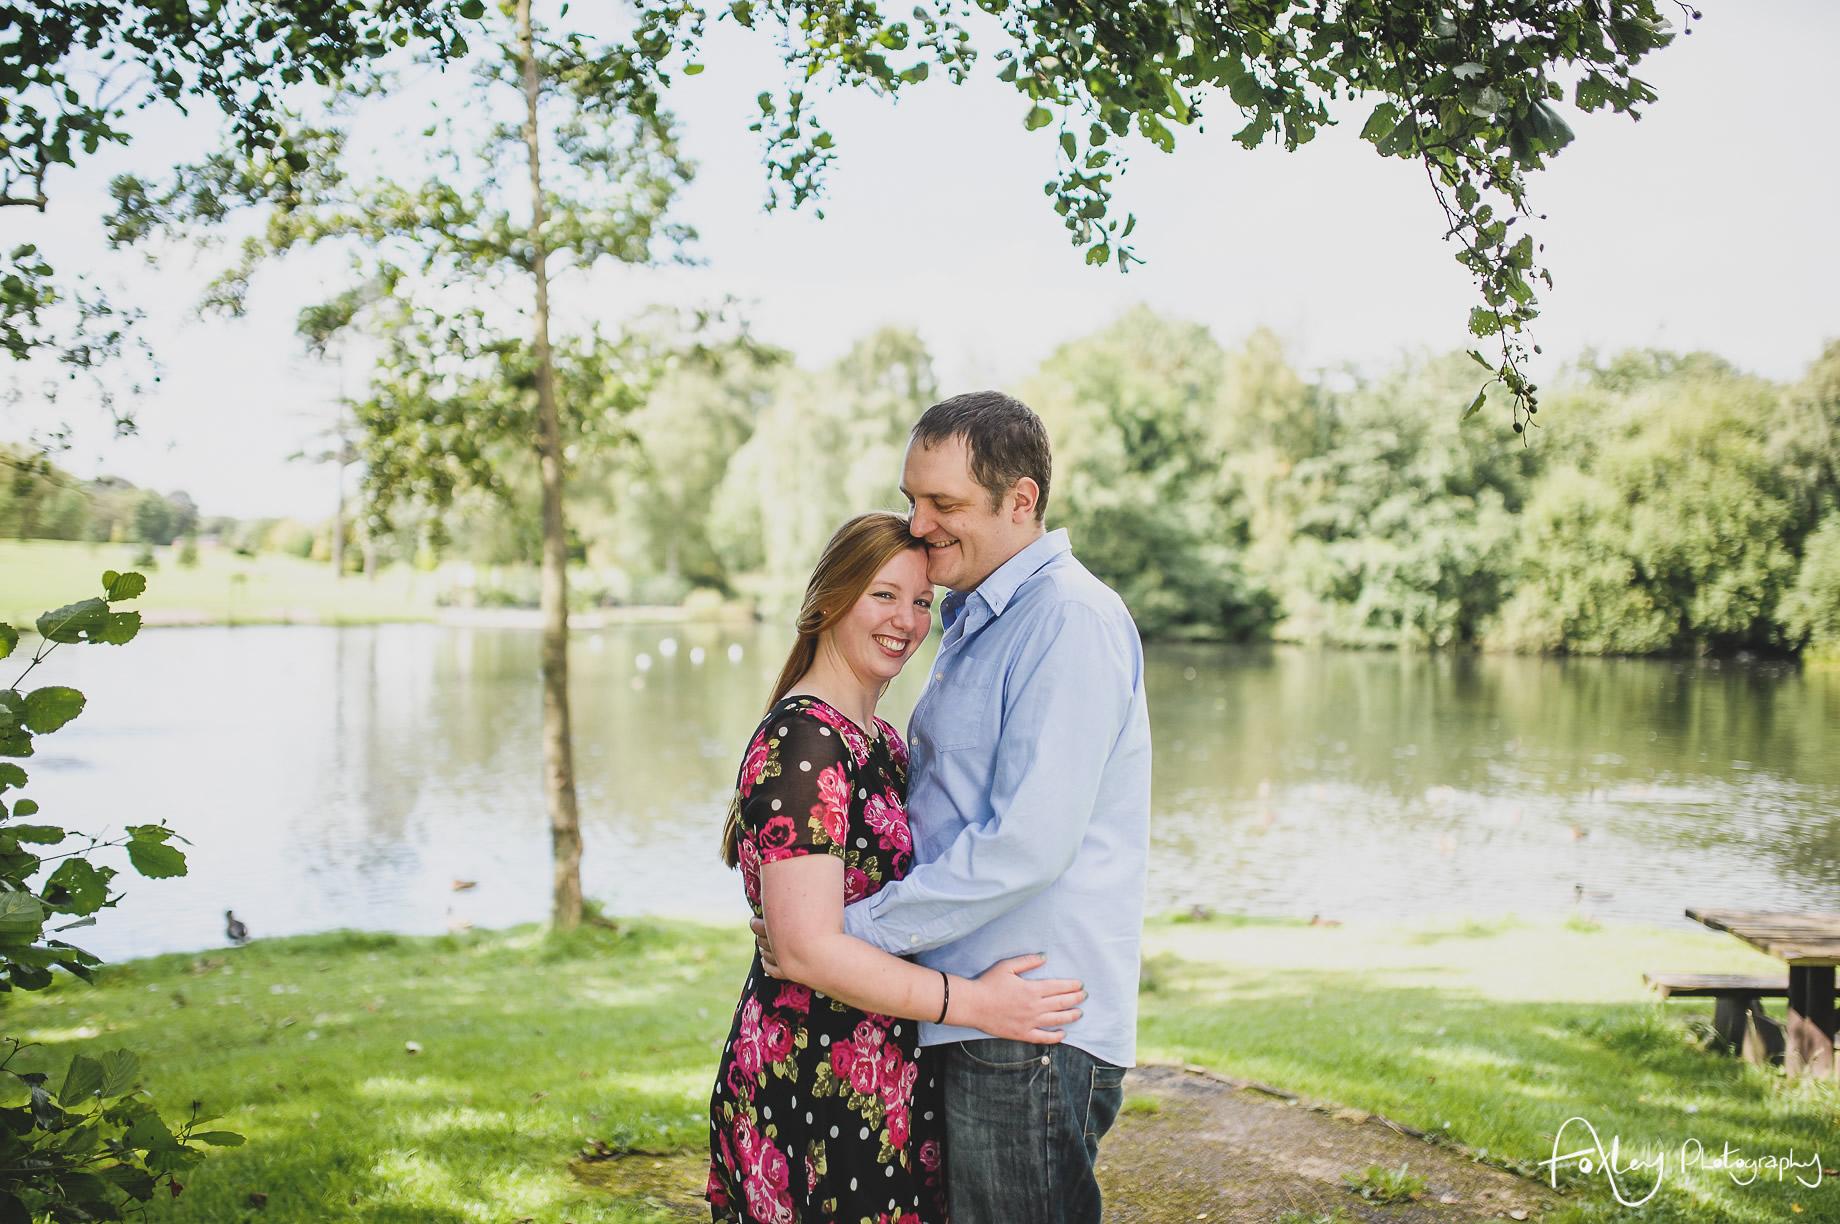 Faye and Doug Pre-Wedding Shoot at Haslam Park 002